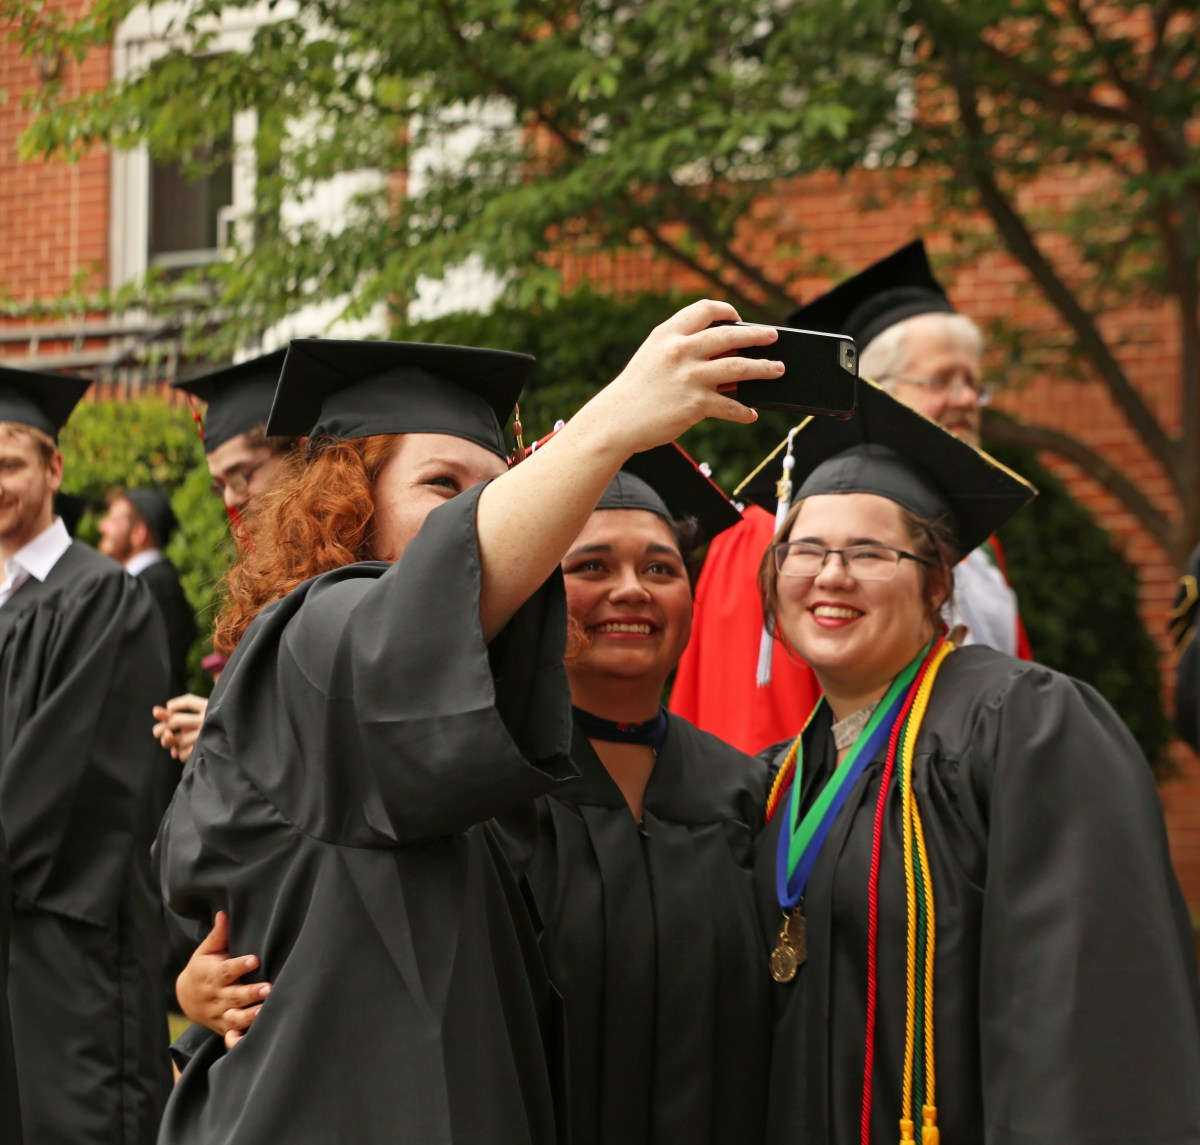 Female graduates taking selfies